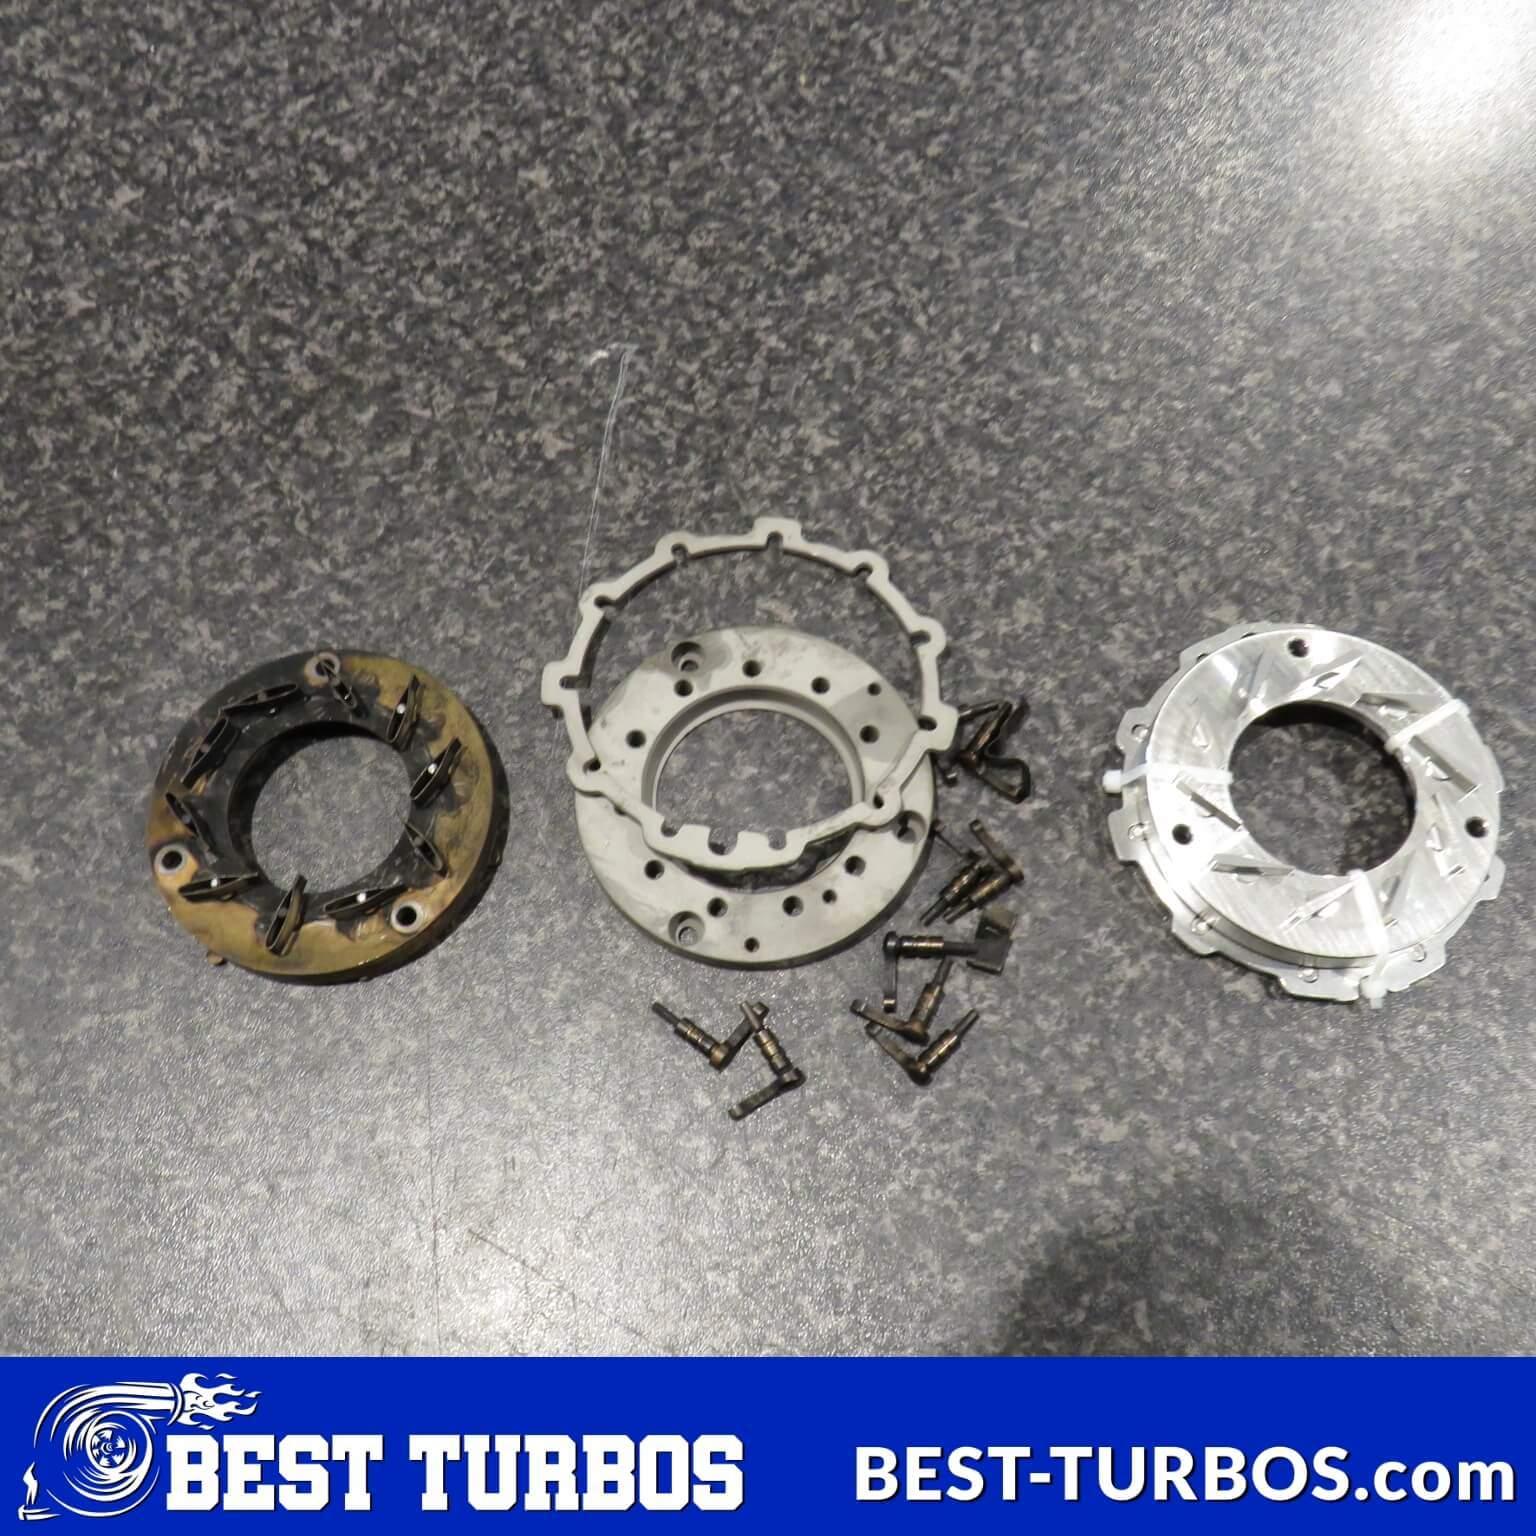 Turbo Reconditioning, Turbo Repairs, Turbo Fitting